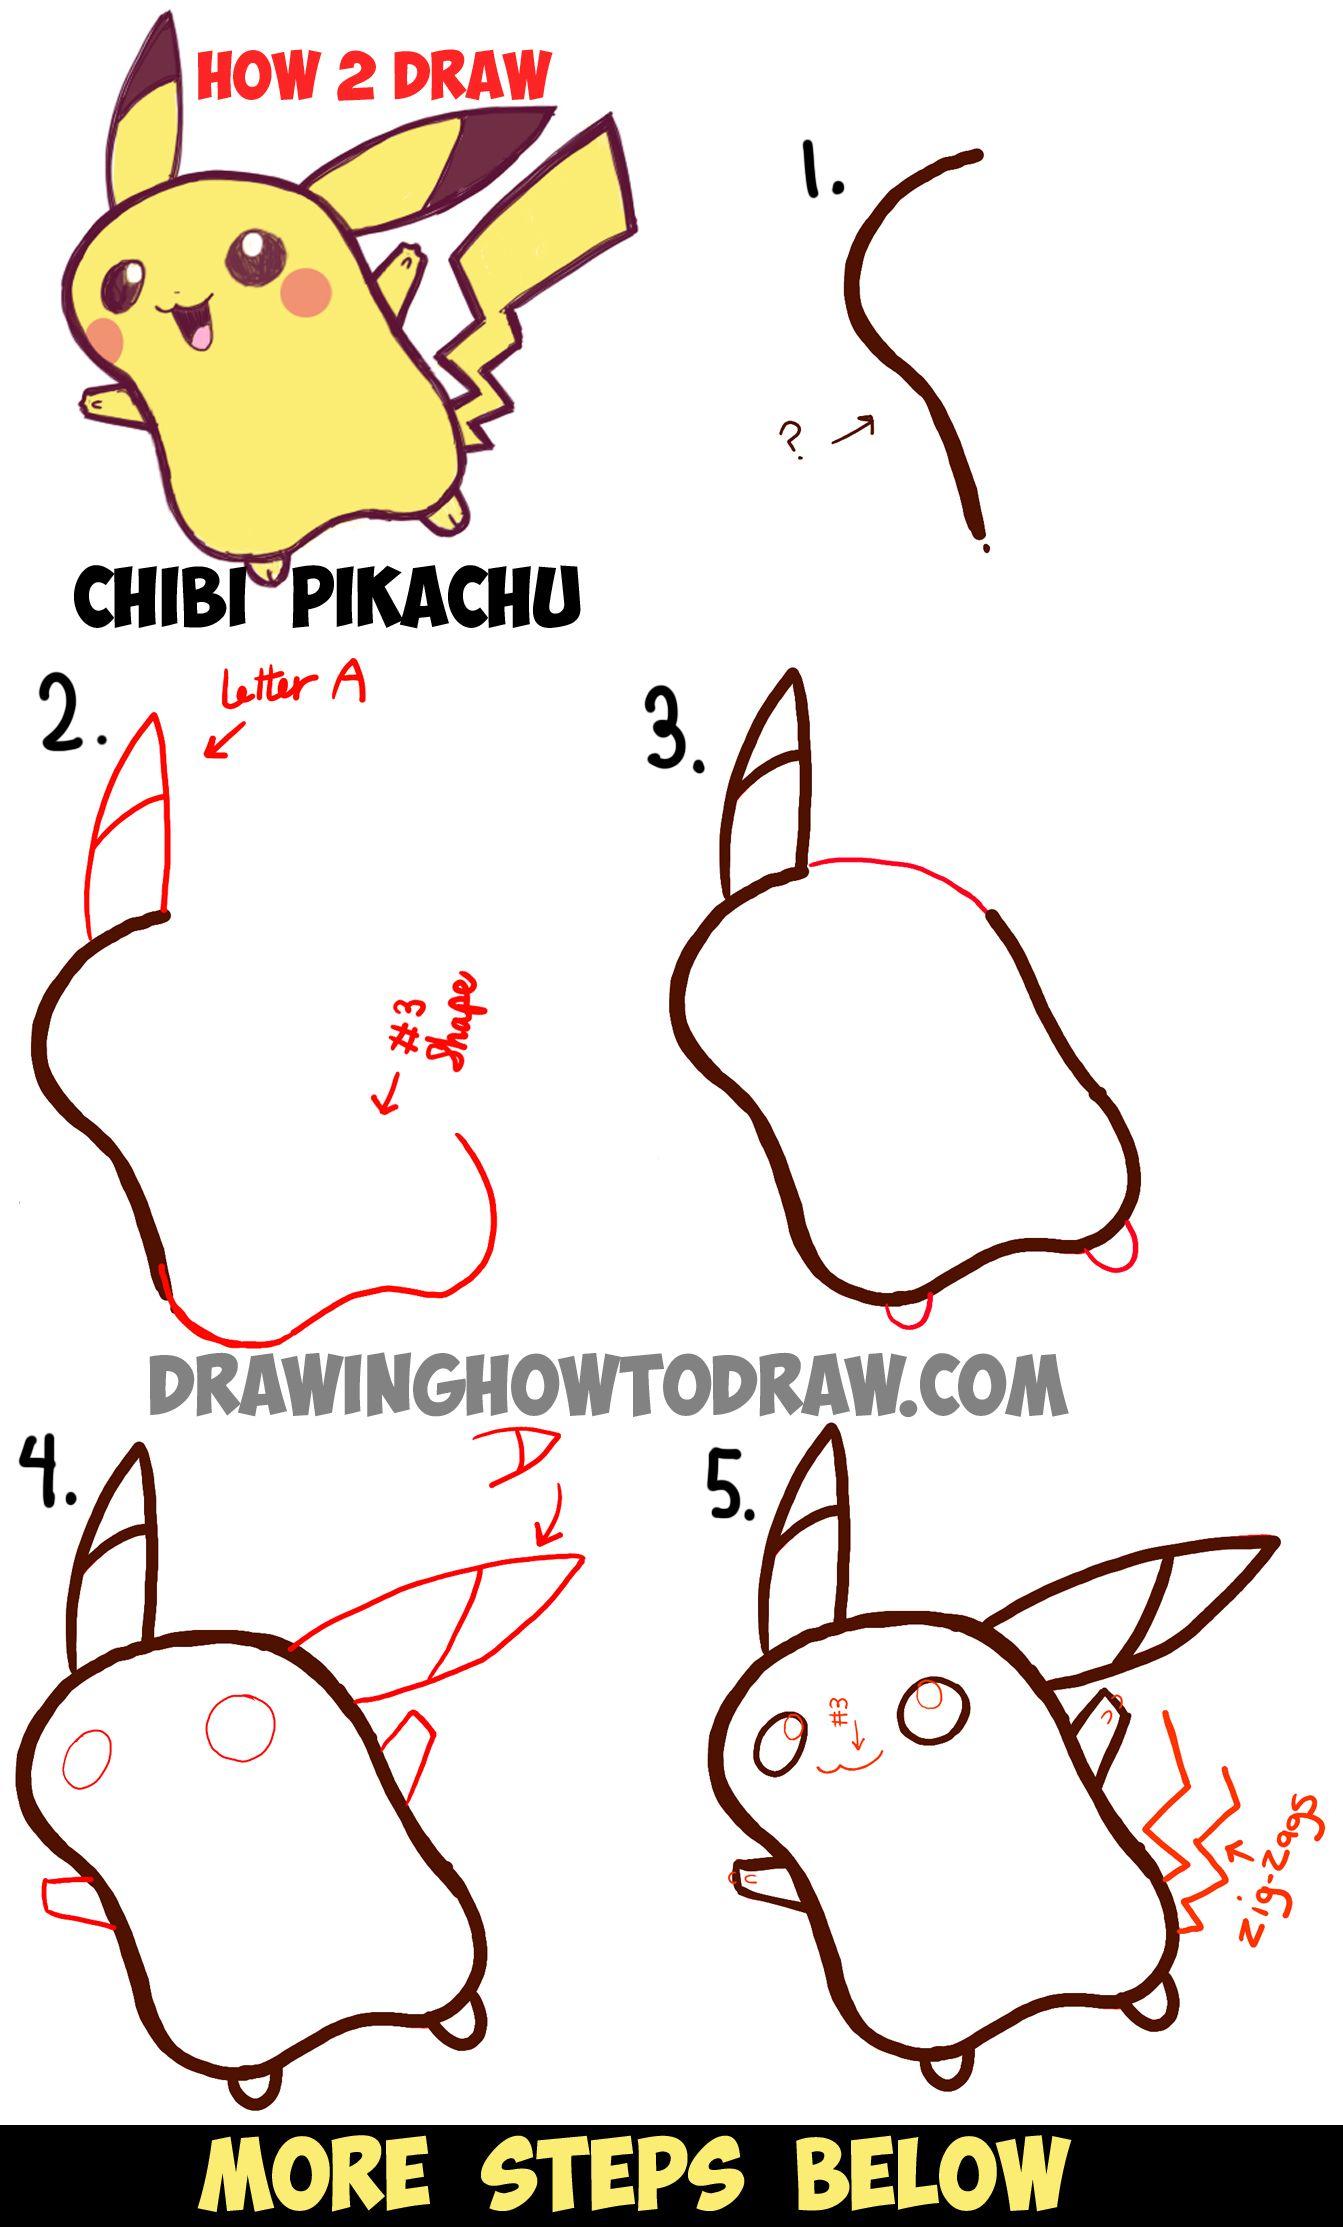 Apprendre  dessiner Cute Baby Chibi Pikachu de Pokemon Easy Steps Dessin Le§on